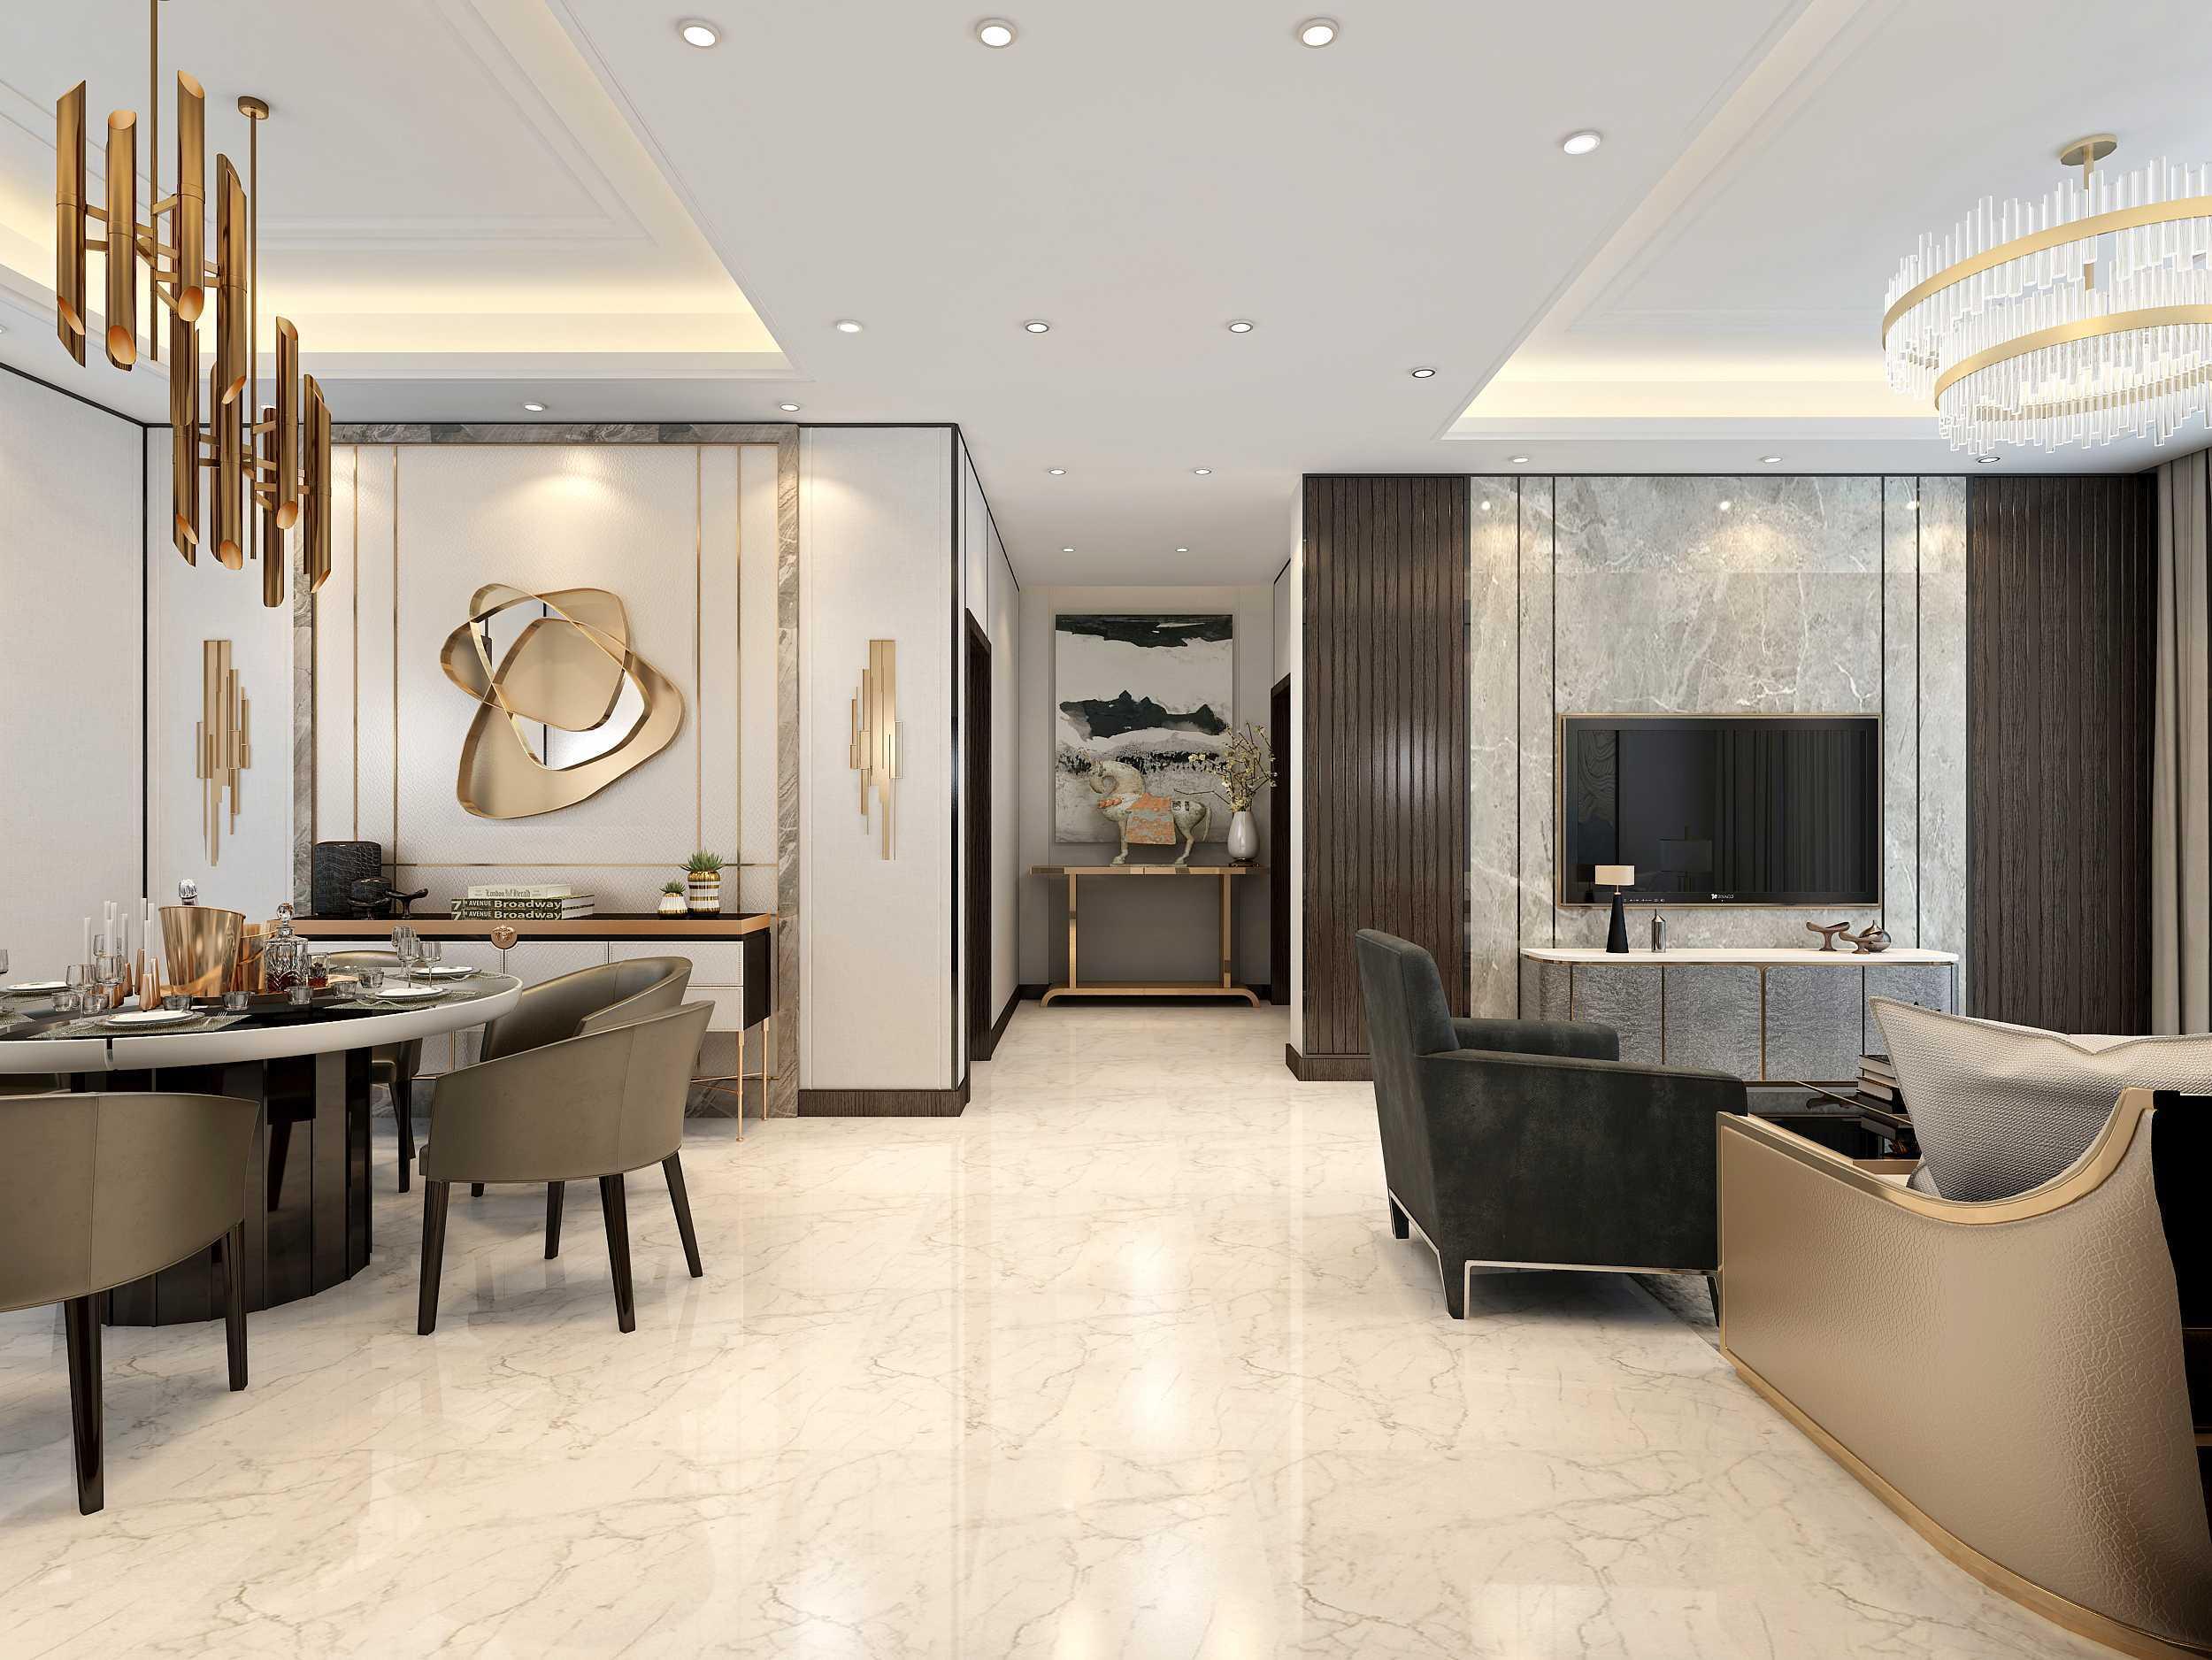 Bej.interior Modern Classic Home Interior Jakarta, Daerah Khusus Ibukota Jakarta, Indonesia Jakarta, Daerah Khusus Ibukota Jakarta, Indonesia Bejinterior-Modern-Classic-Home-Interior   80488